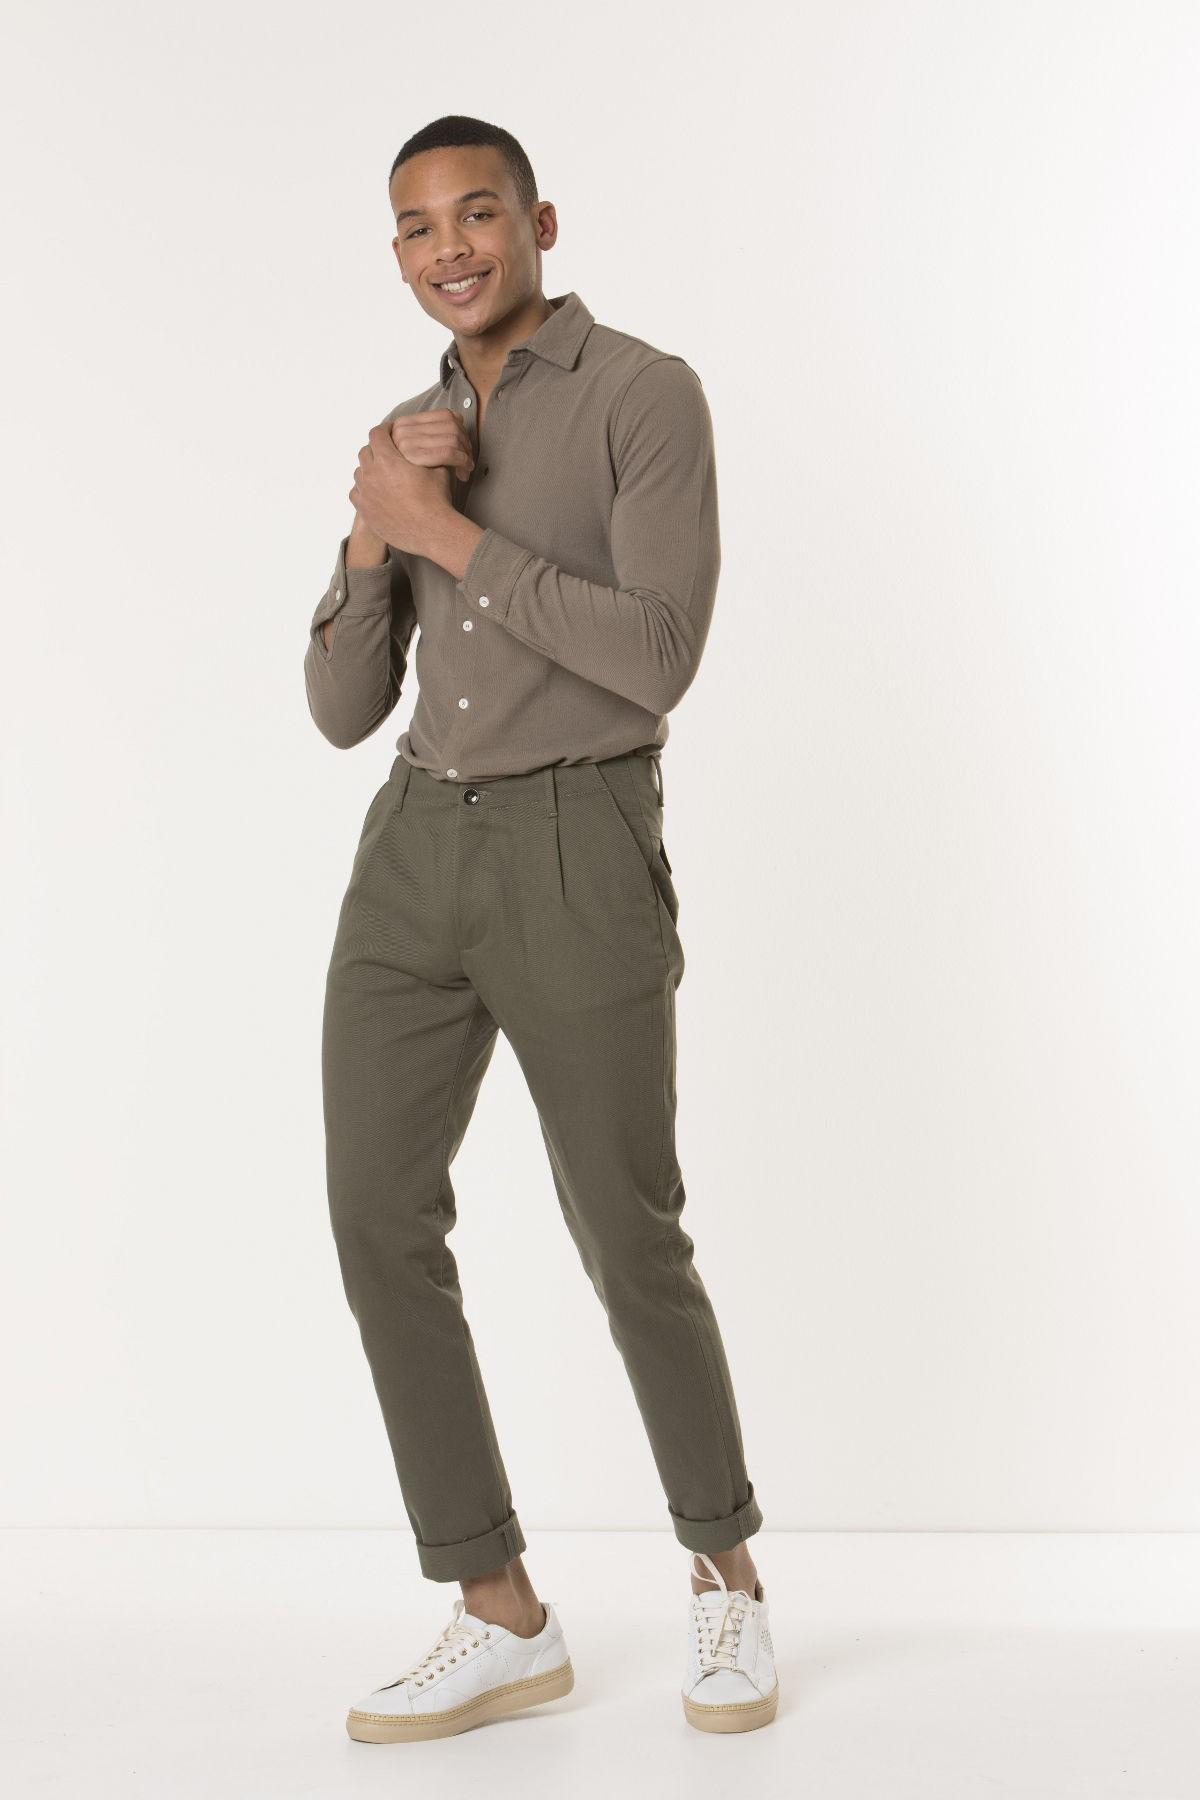 Pantaloni per uomo NINE IN THE MORNING A/I 17-18